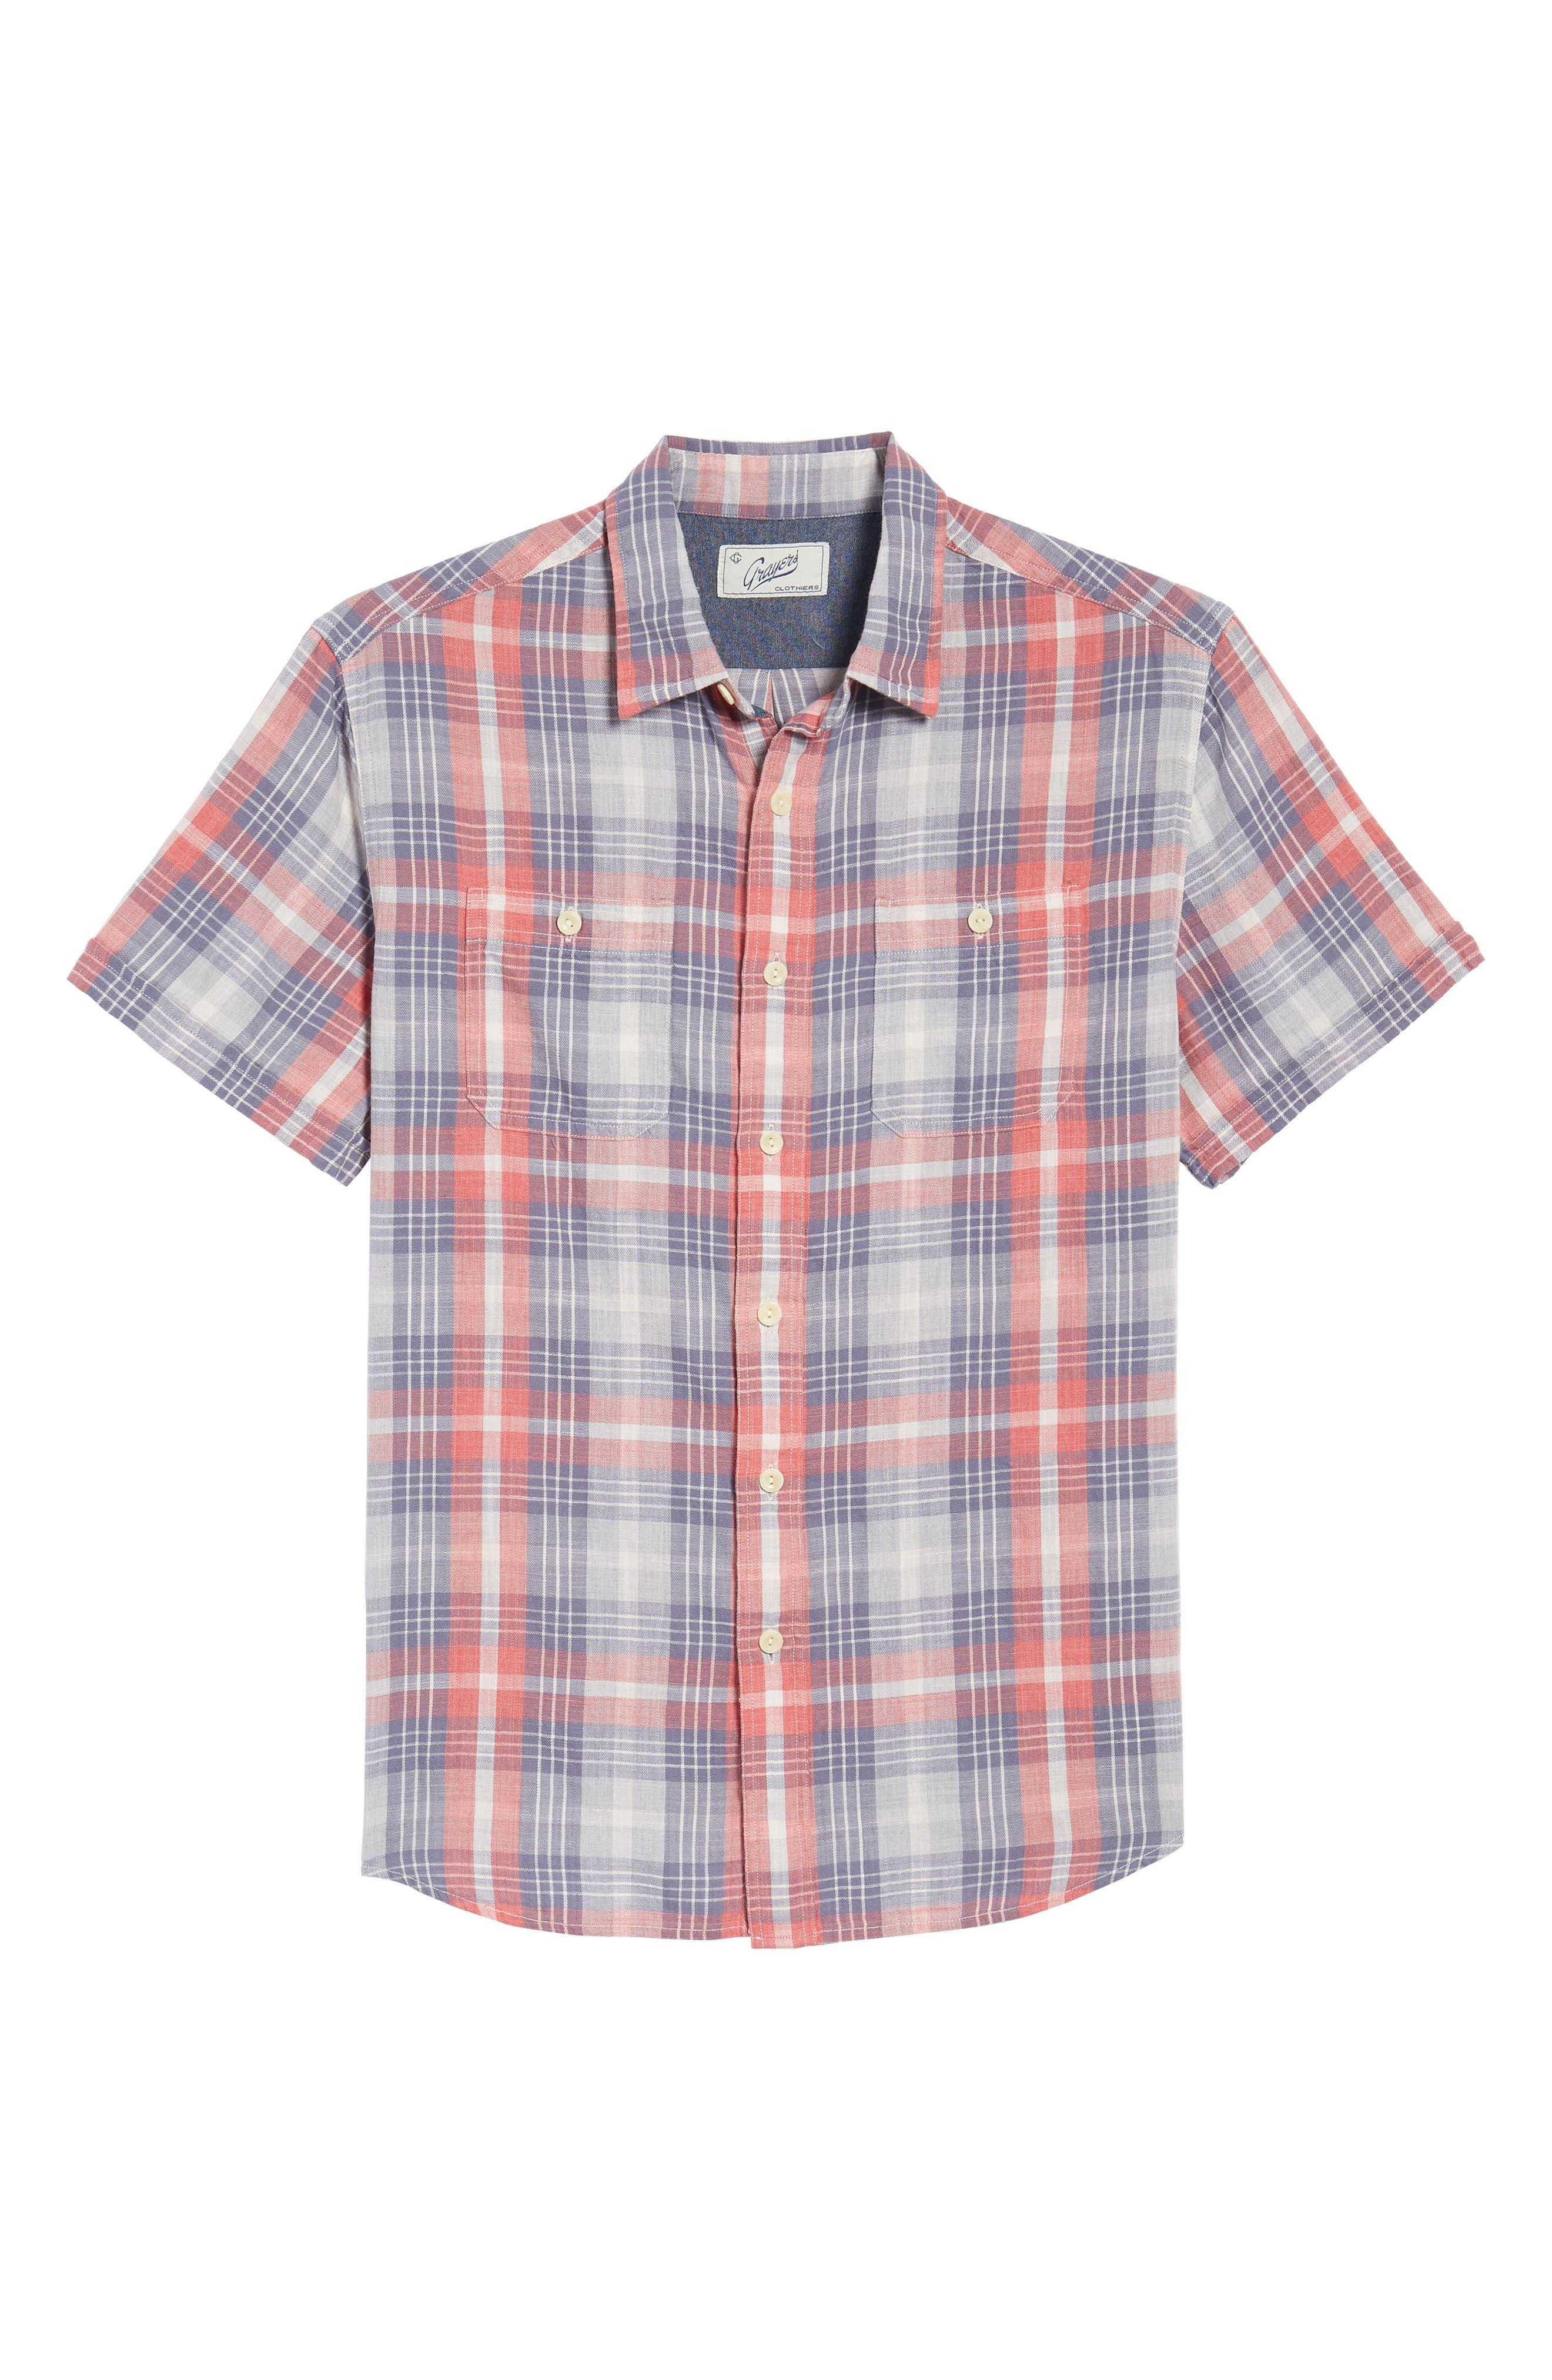 Reynolds Short Sleeve Sport Shirt,                             Alternate thumbnail 6, color,                             Red Gray Plaid